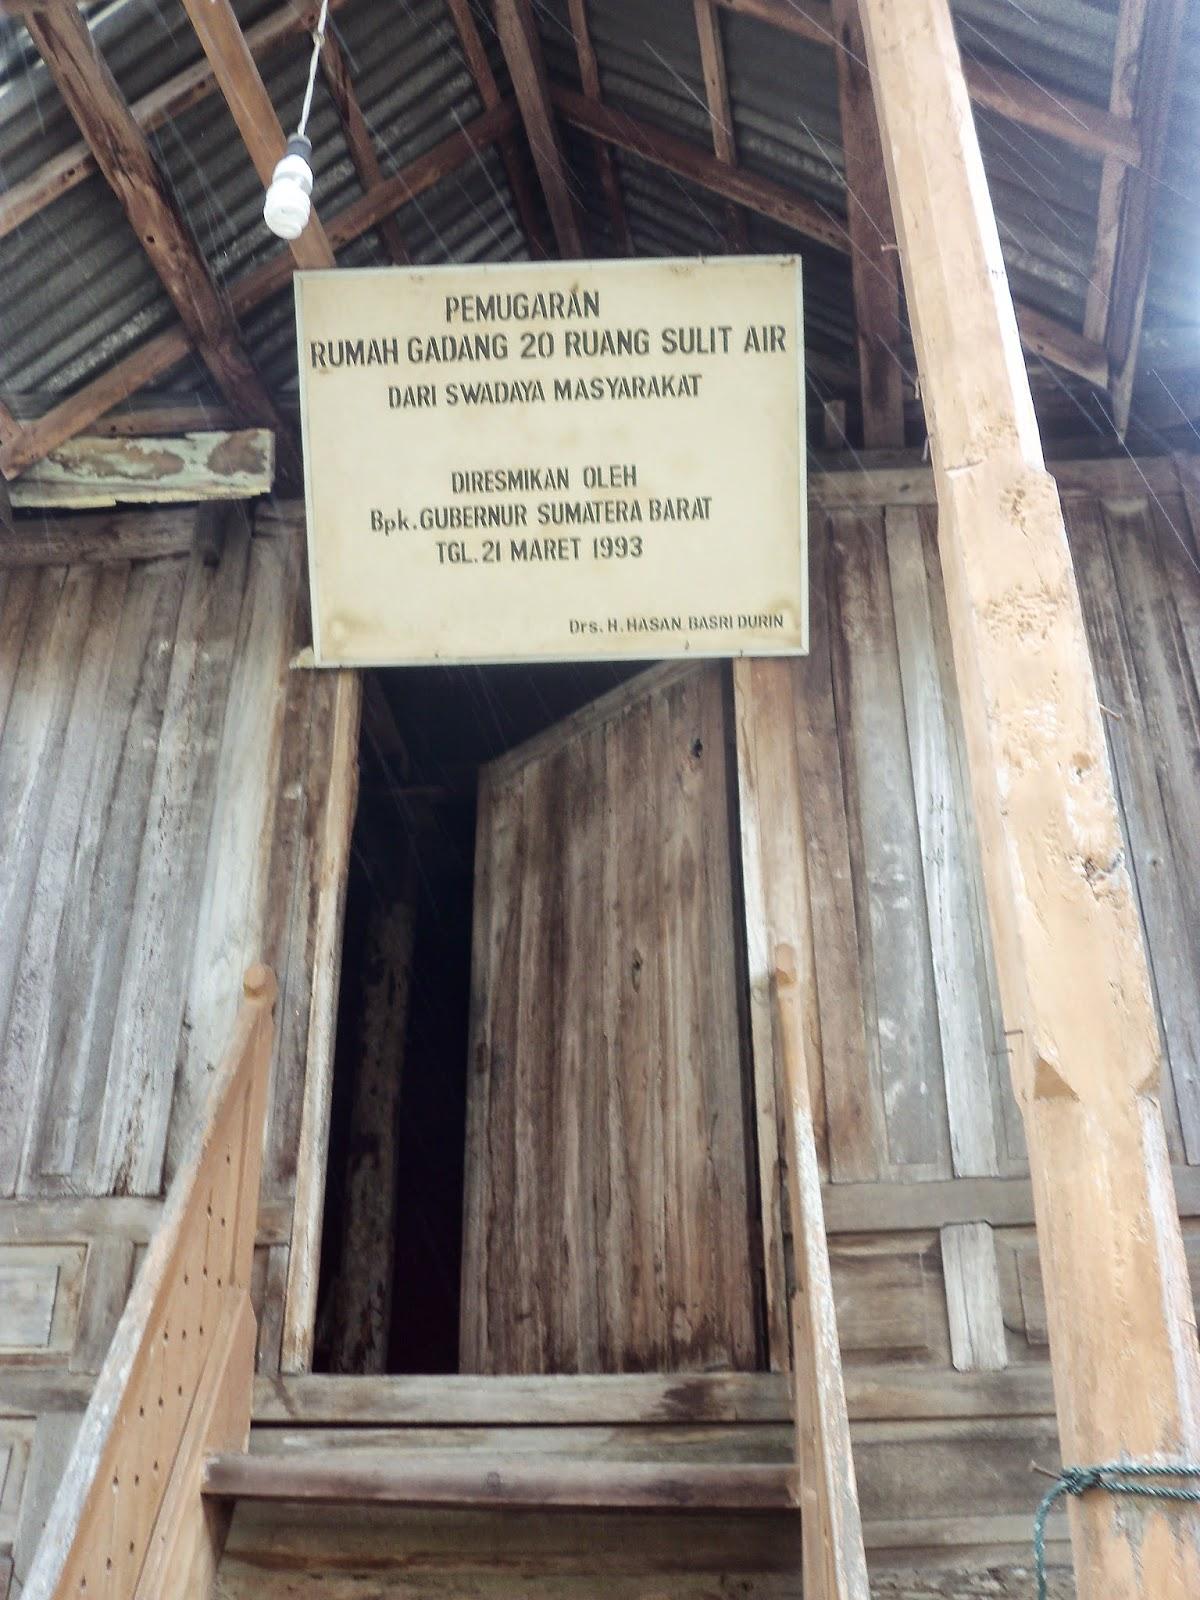 rumah gadang 20 ruang di sulit air, sumatera barat